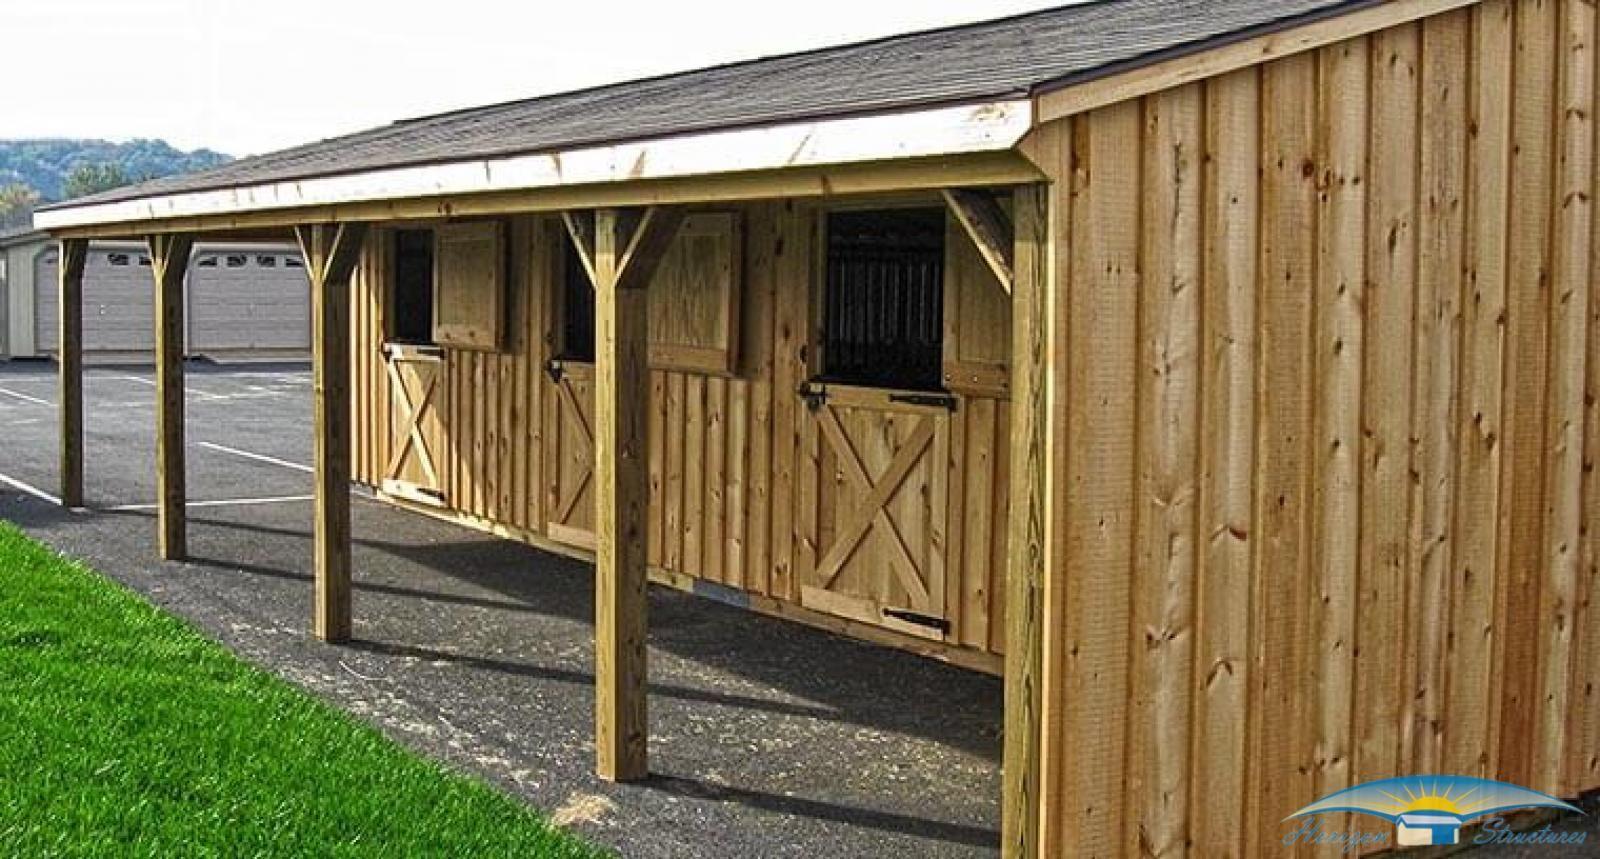 Shedrow Horse Barns Shed Row Barns Horizon Structures Garden